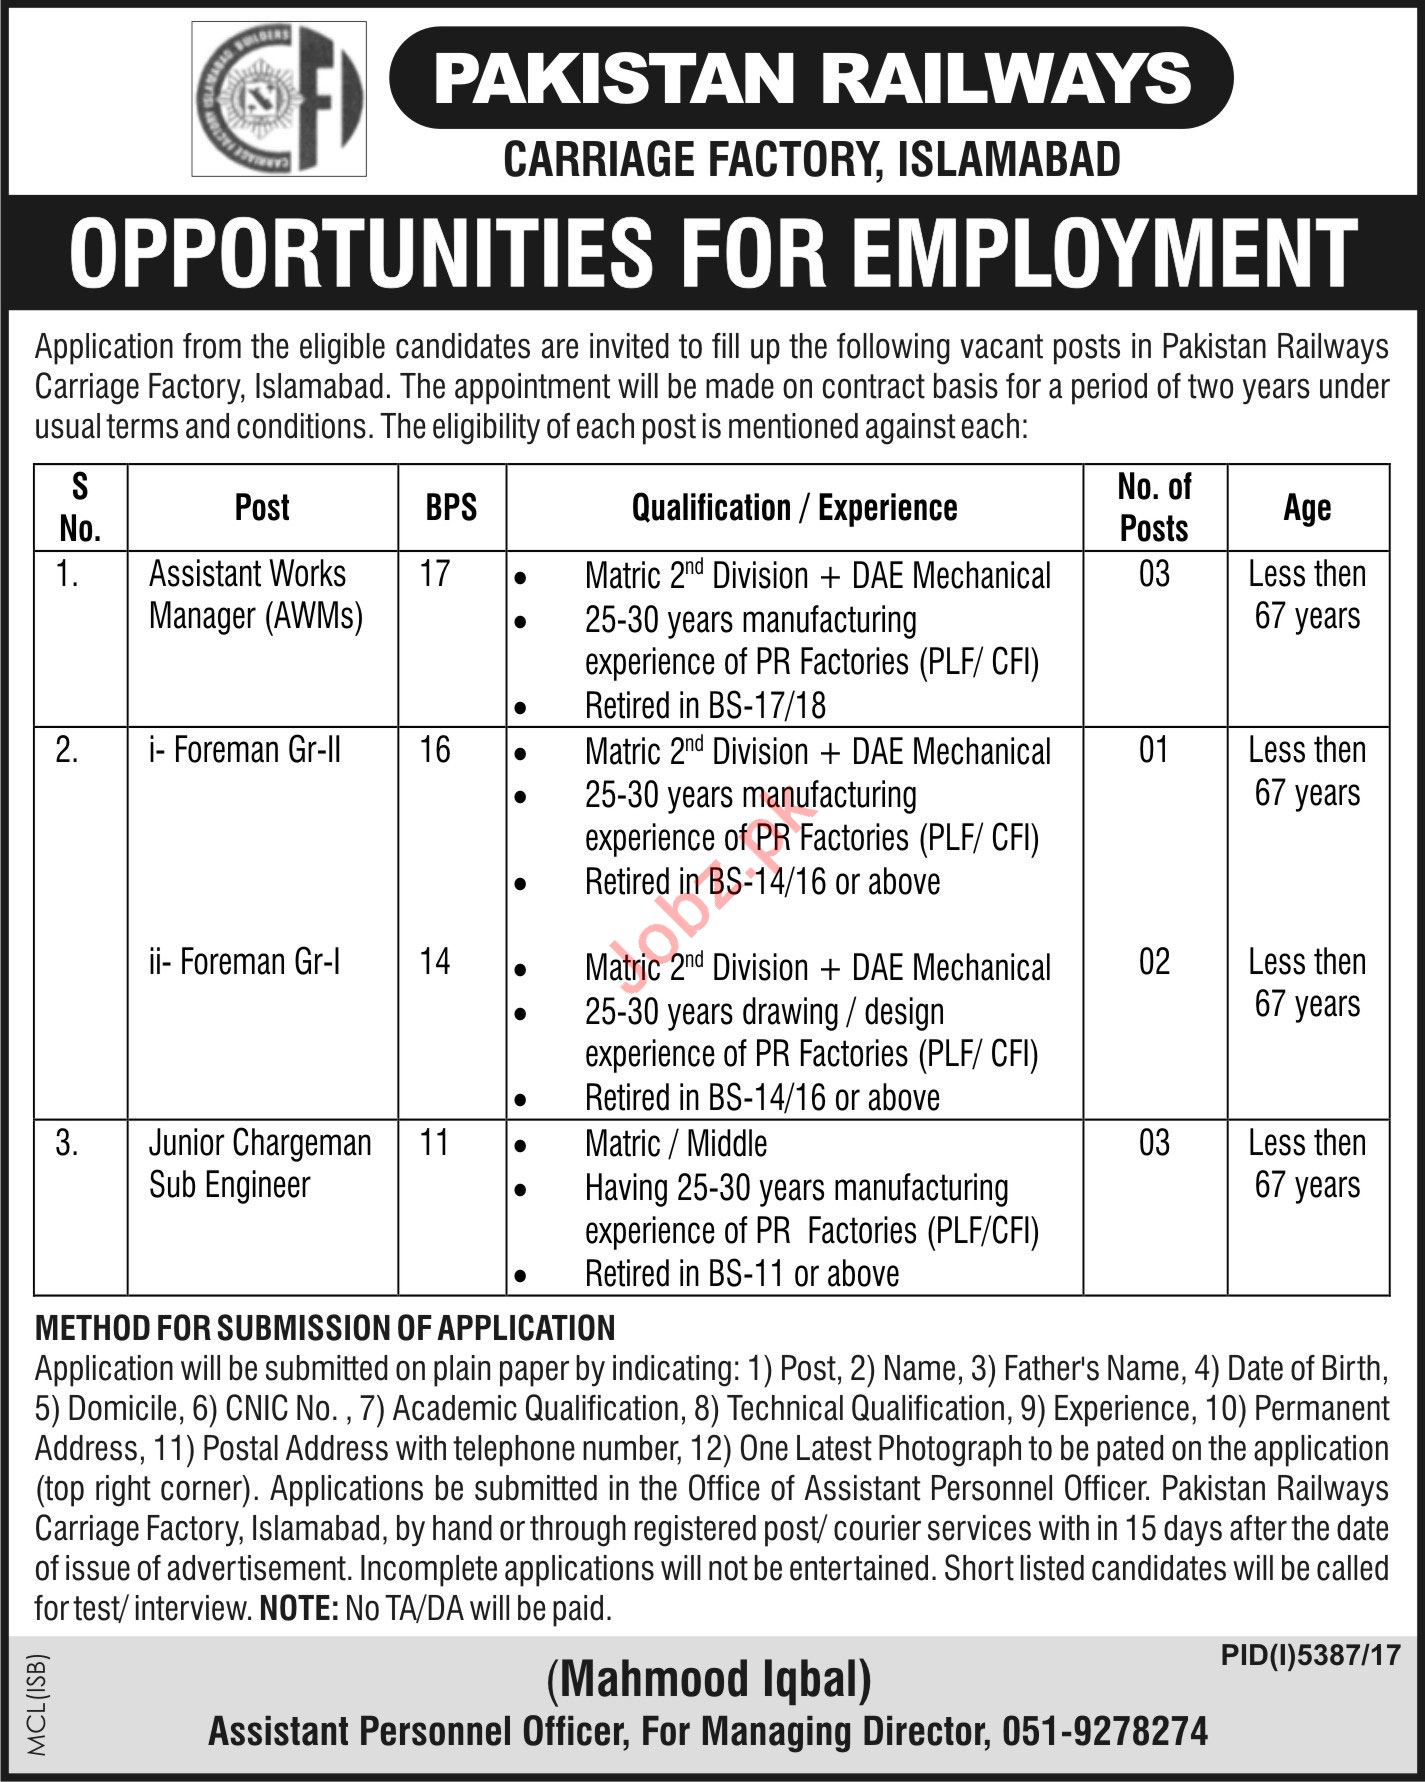 Pakistan Railways Carriage Factory Islamabad Jobs 2018